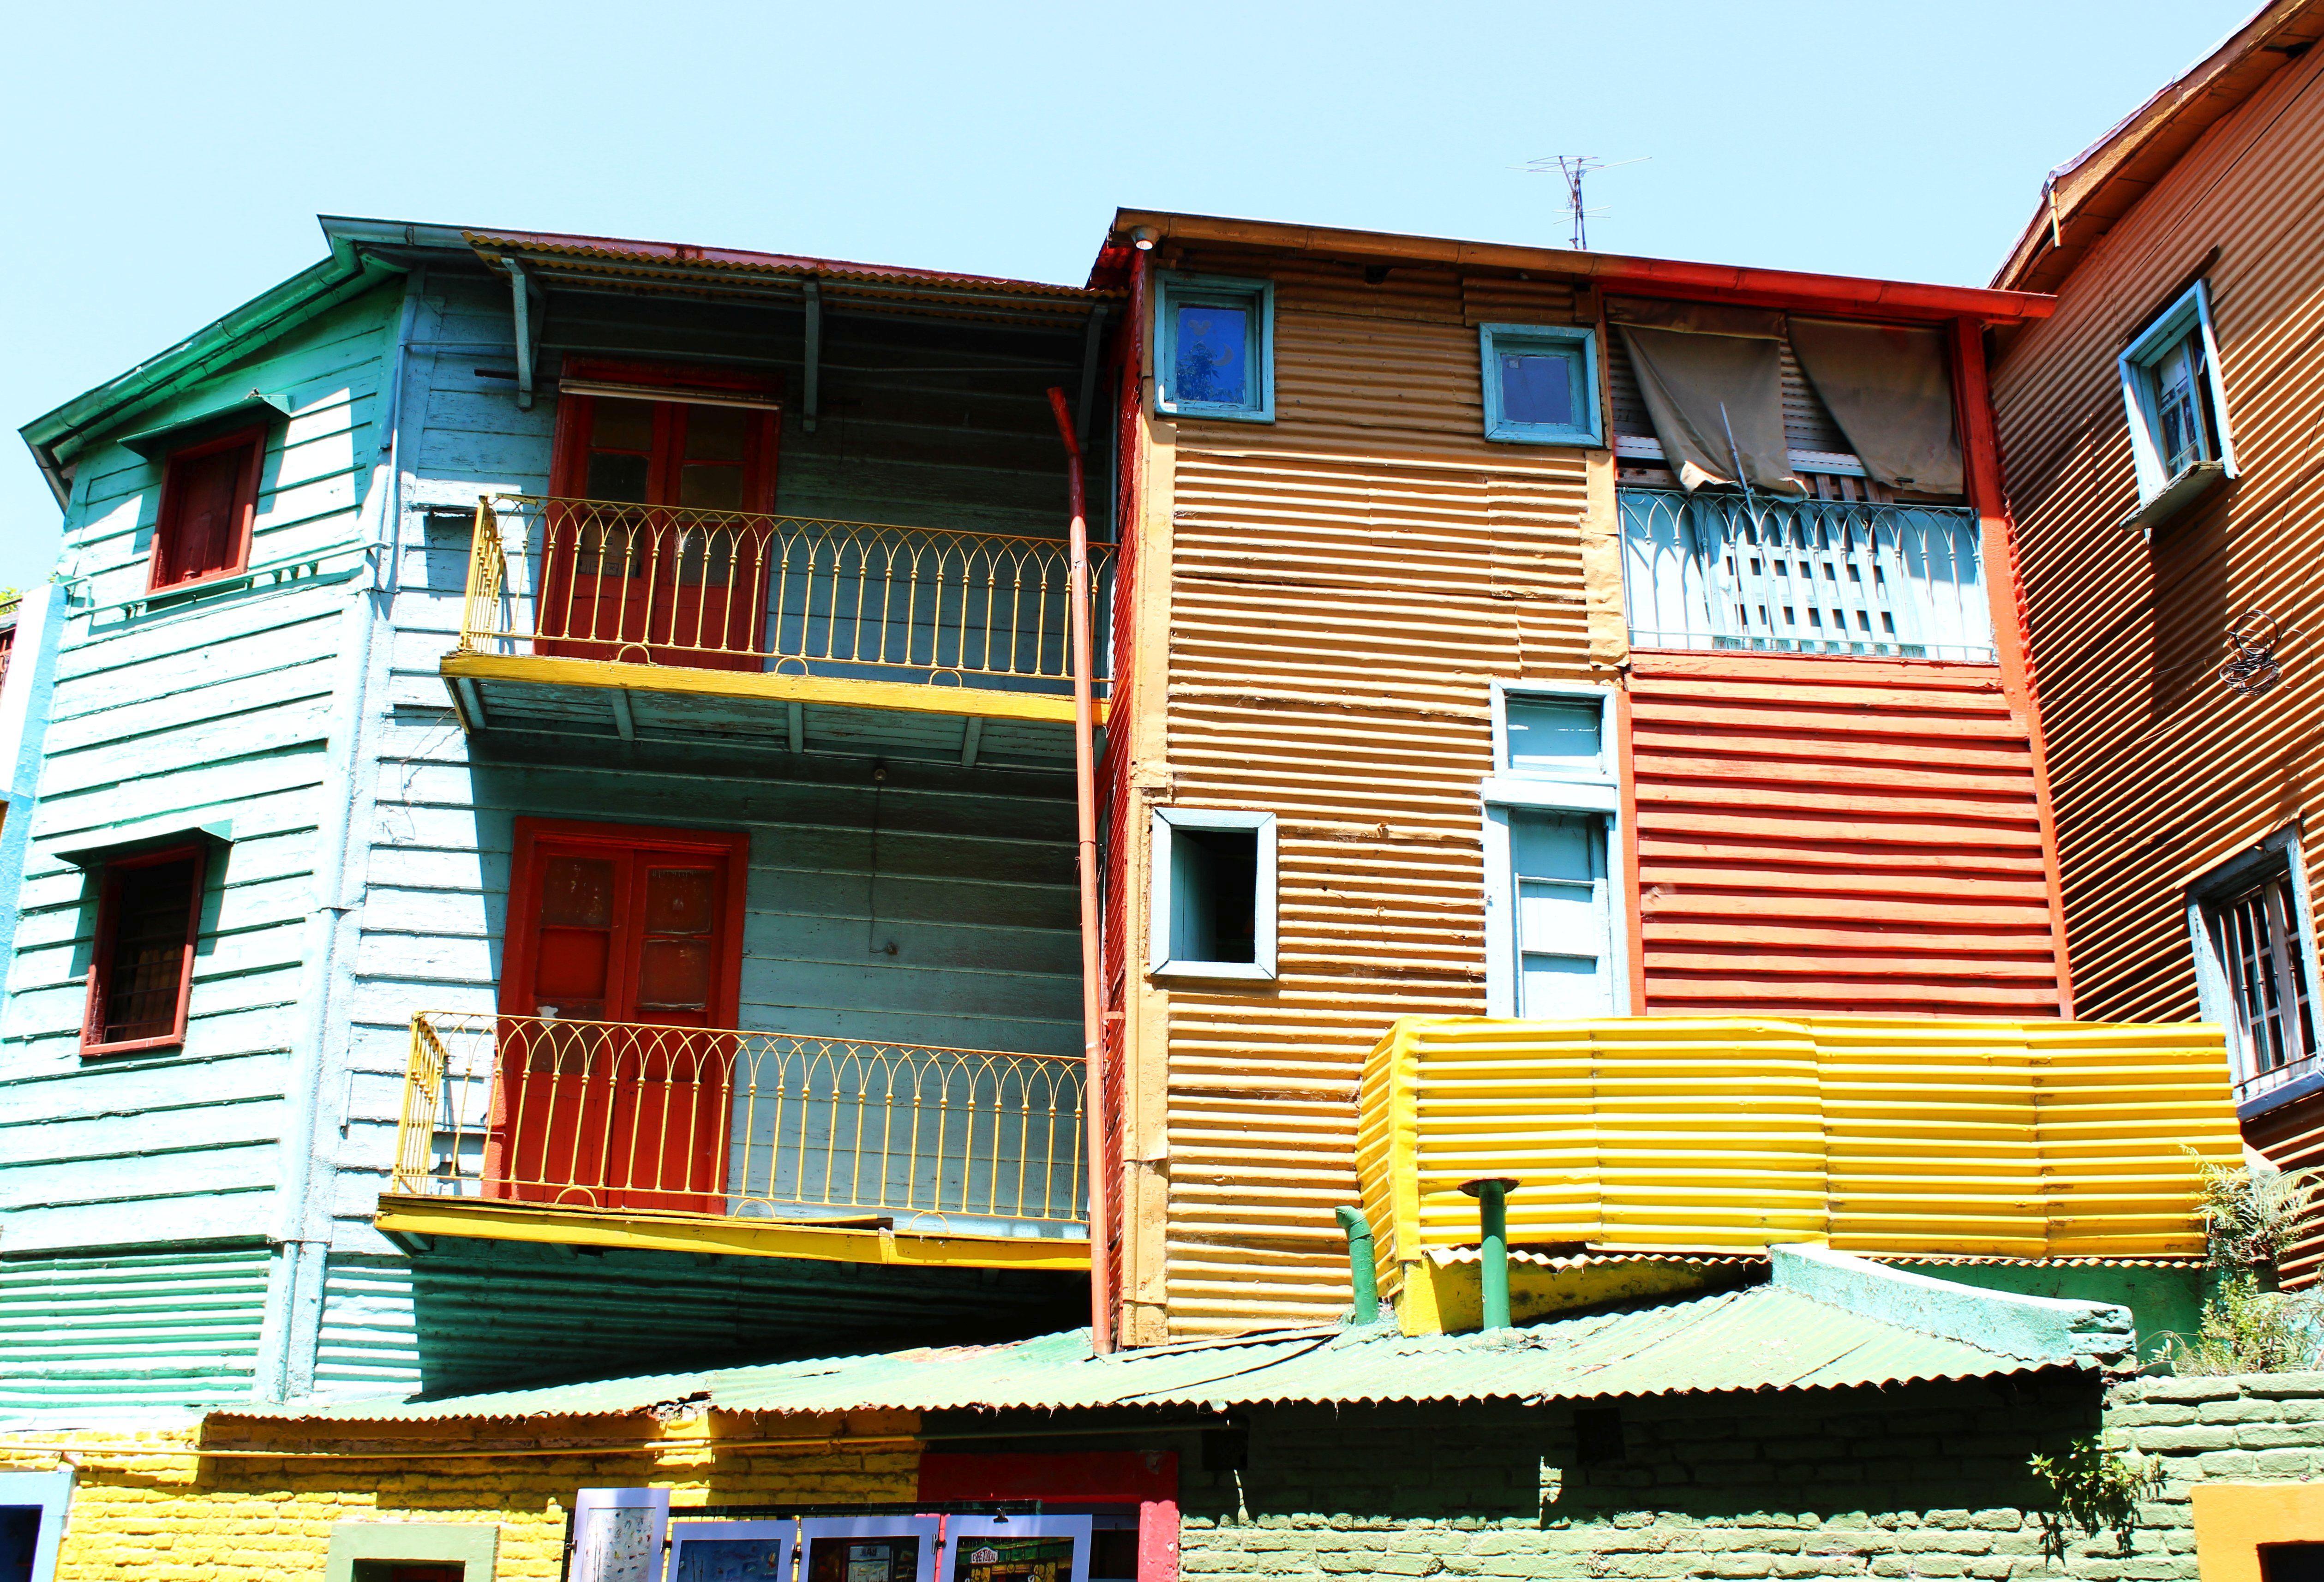 Argentína, Buenos Aires-La Boca negyed - Fotó: Papp Éva